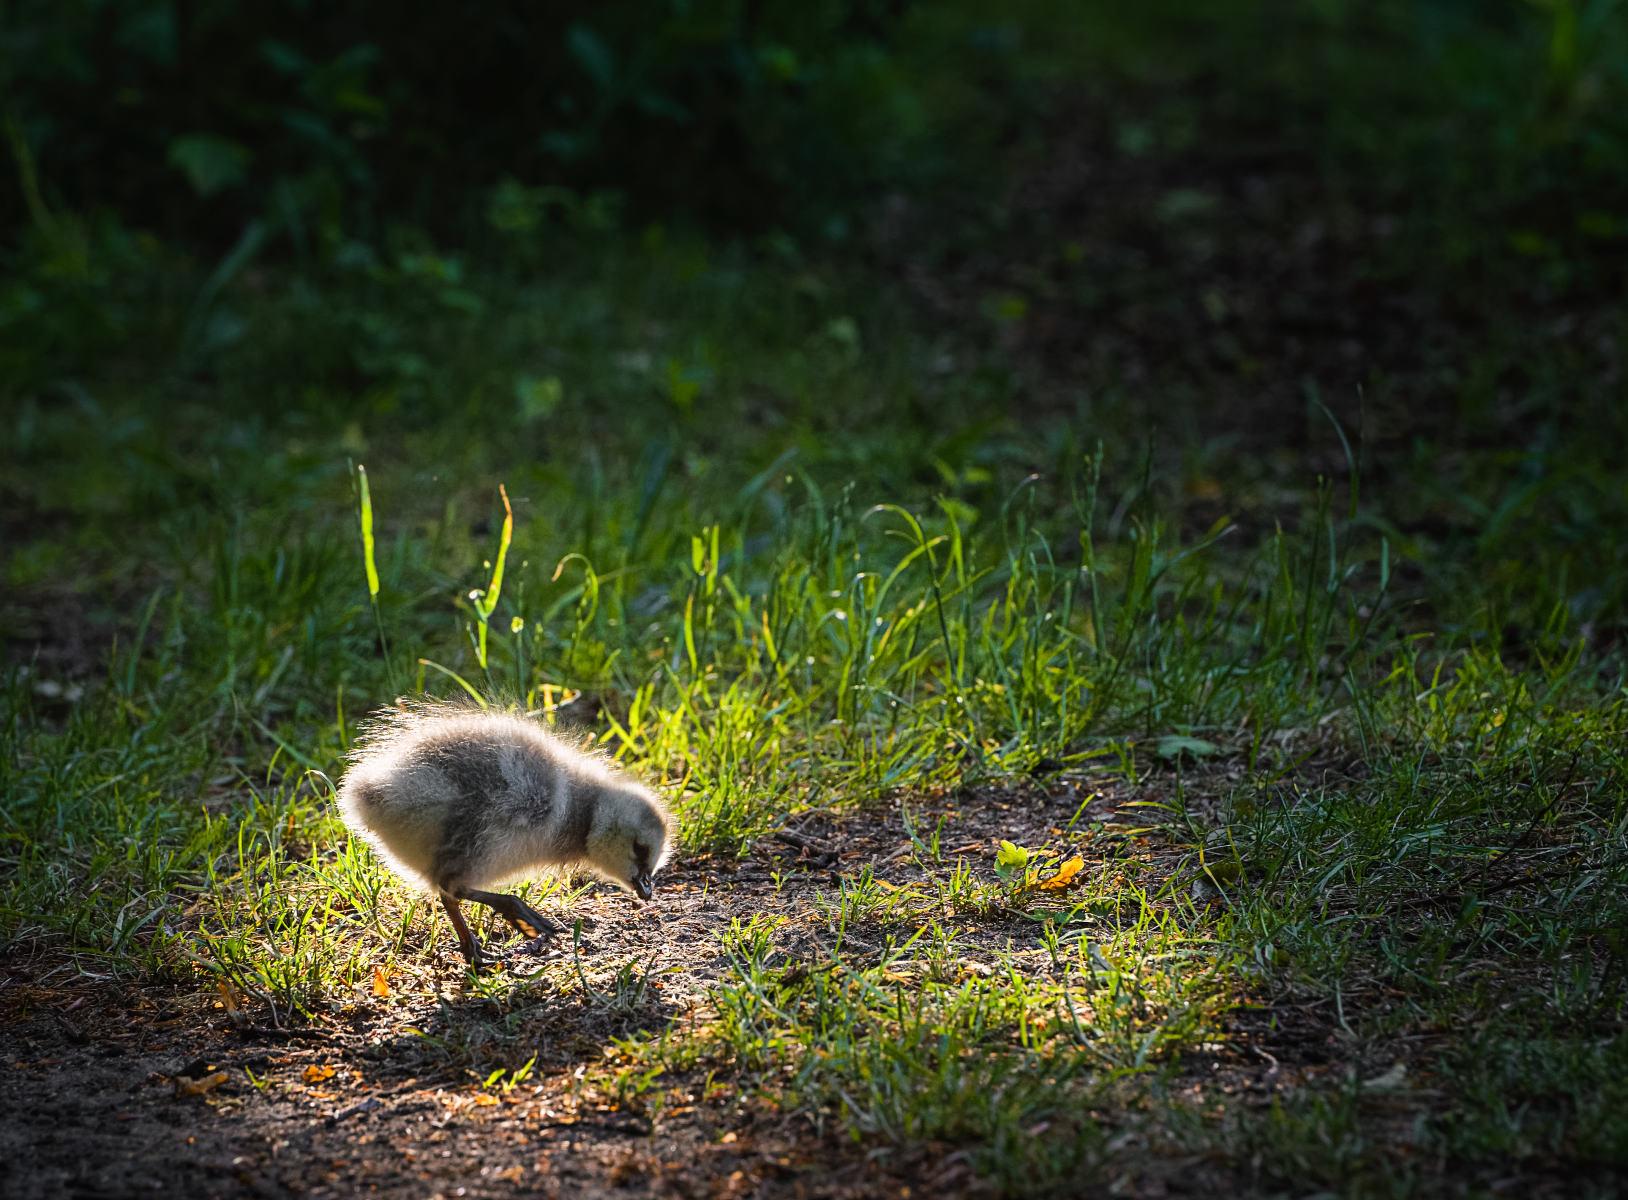 barnacle gosling pecking around in a sunbeam